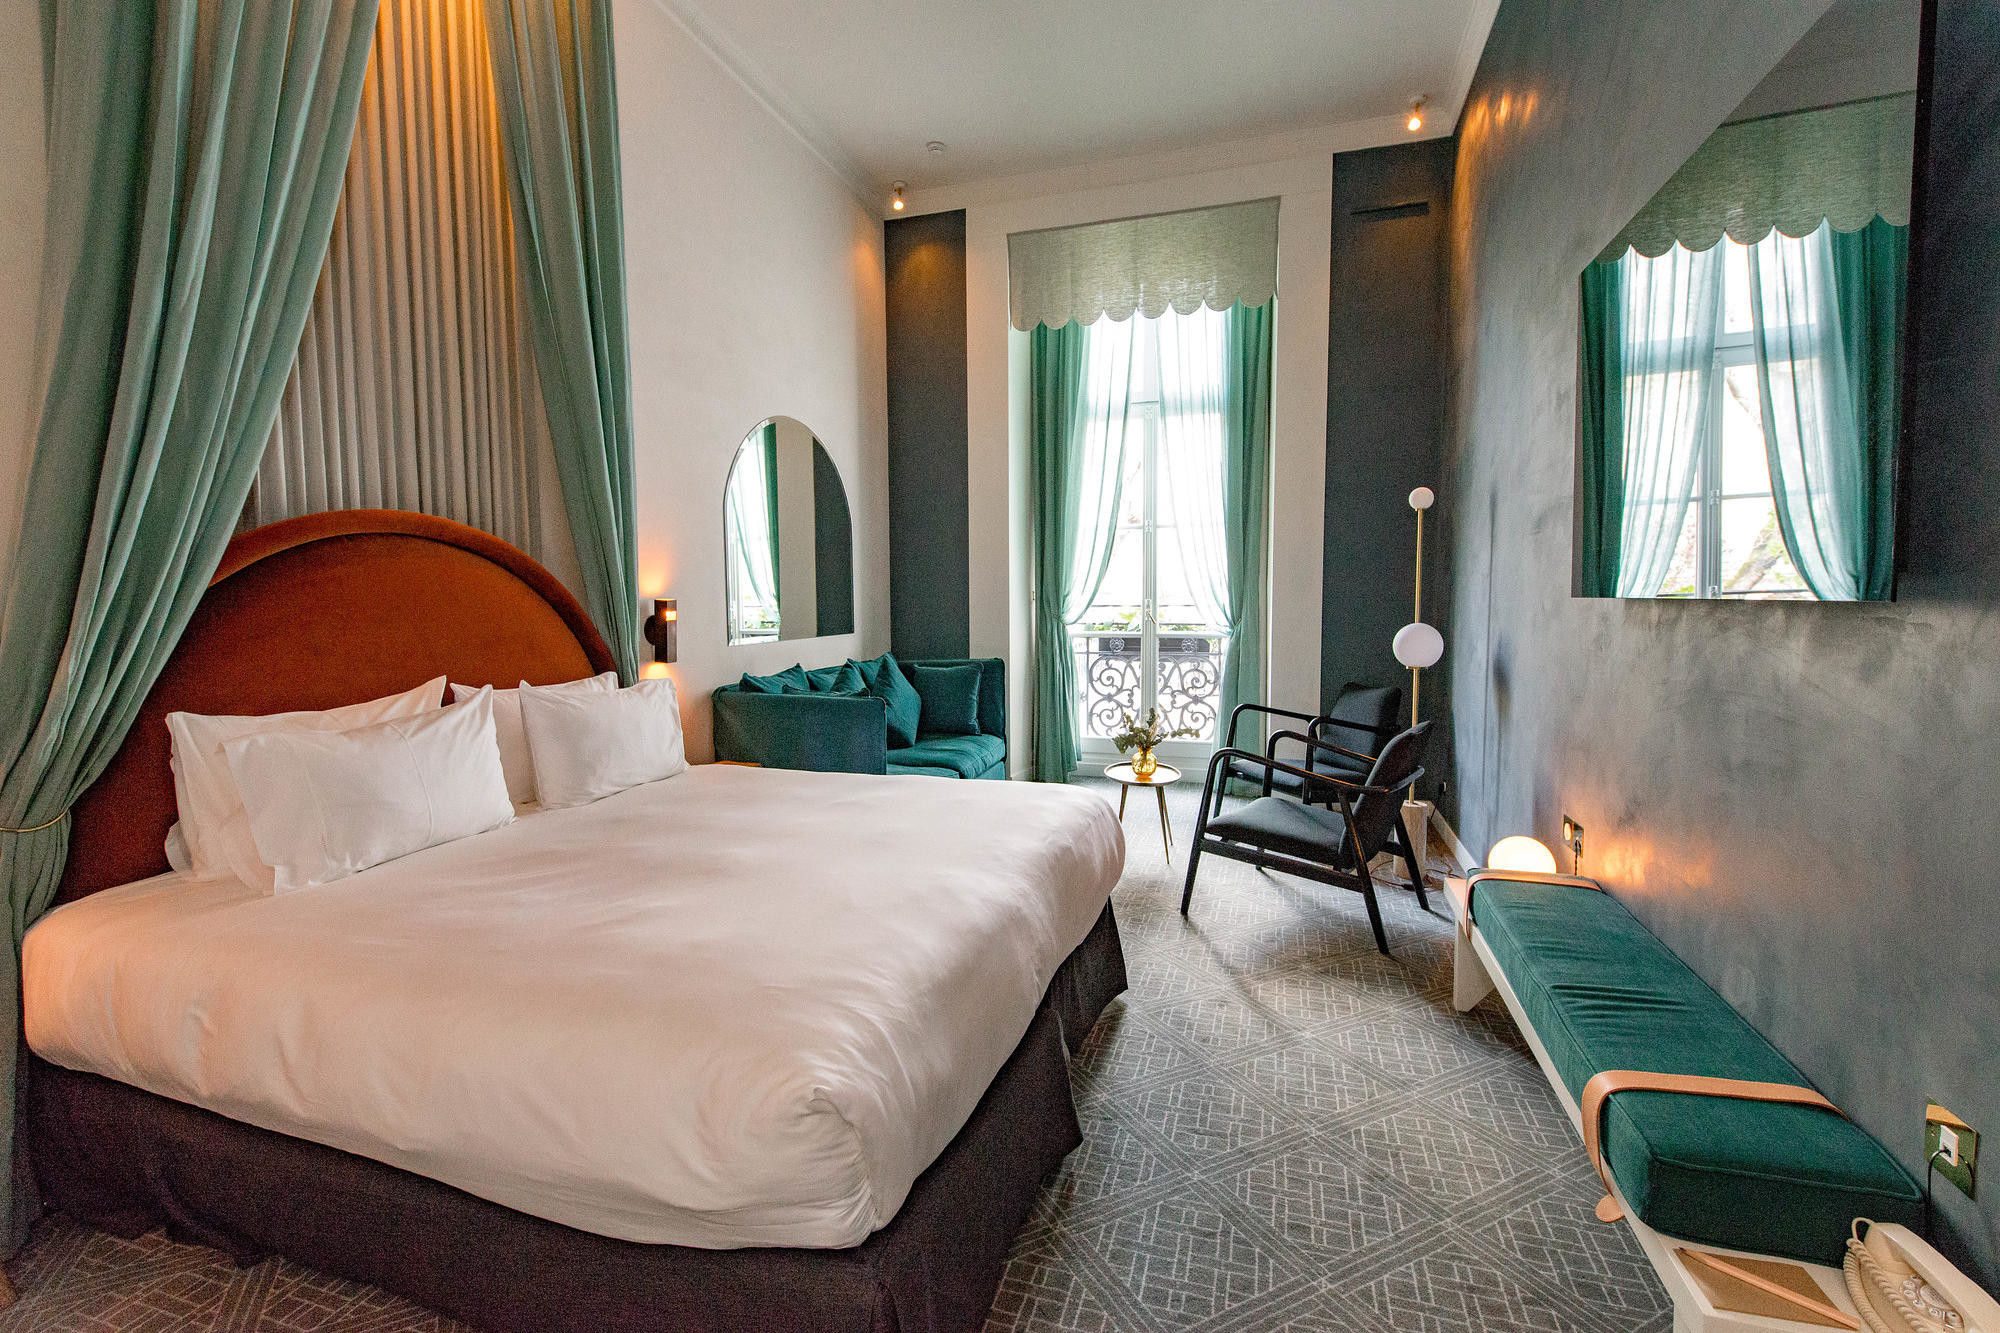 Mid-century style guest room at Hotel des Grands Boulevards, Paris